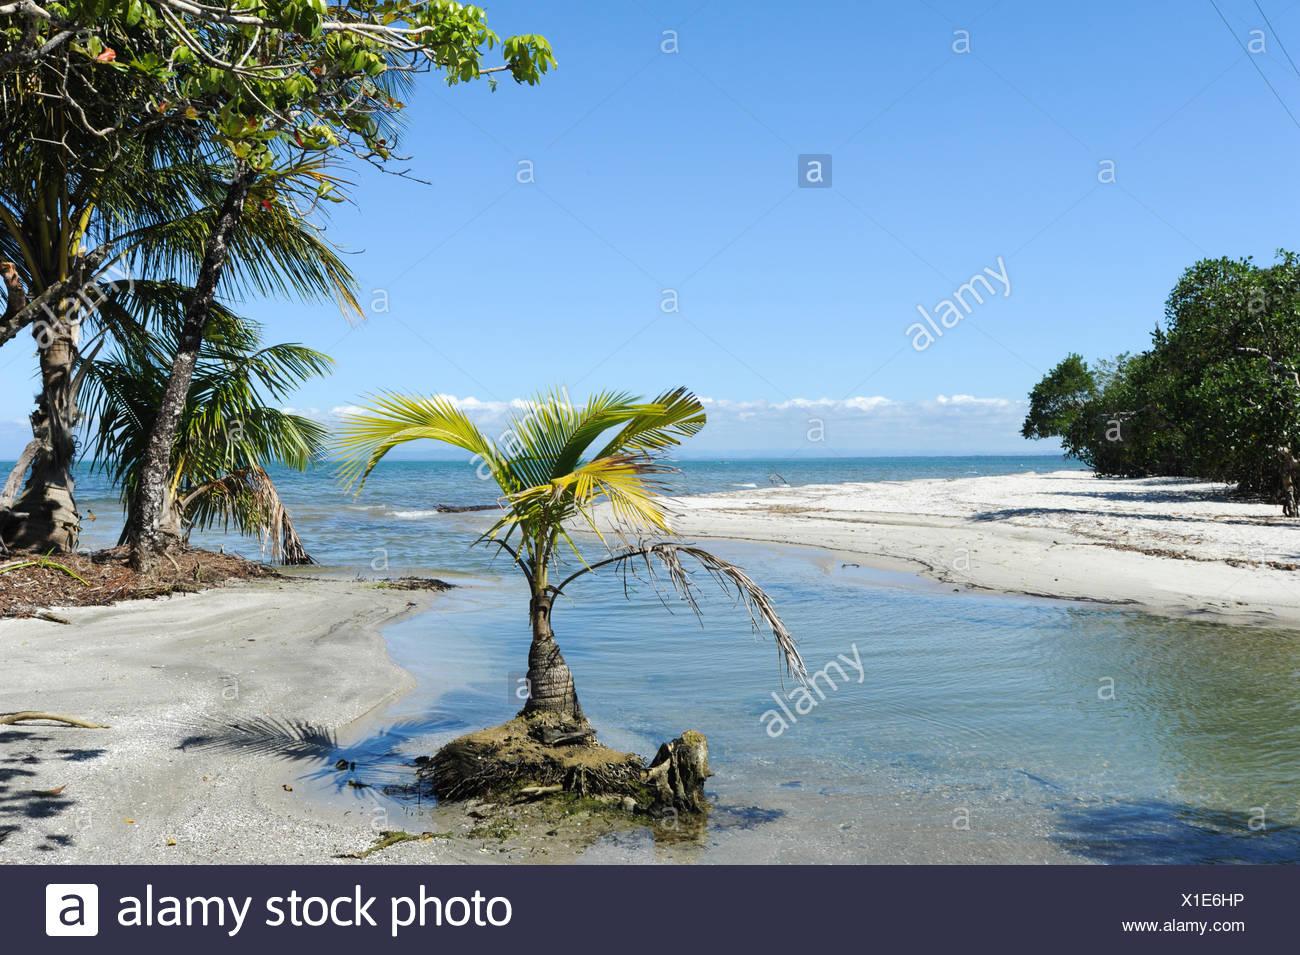 Guatemala, Central America, beach, Livingston, nature, ocean, palm trees, playa blanca, sand, scenic, trees - Stock Image